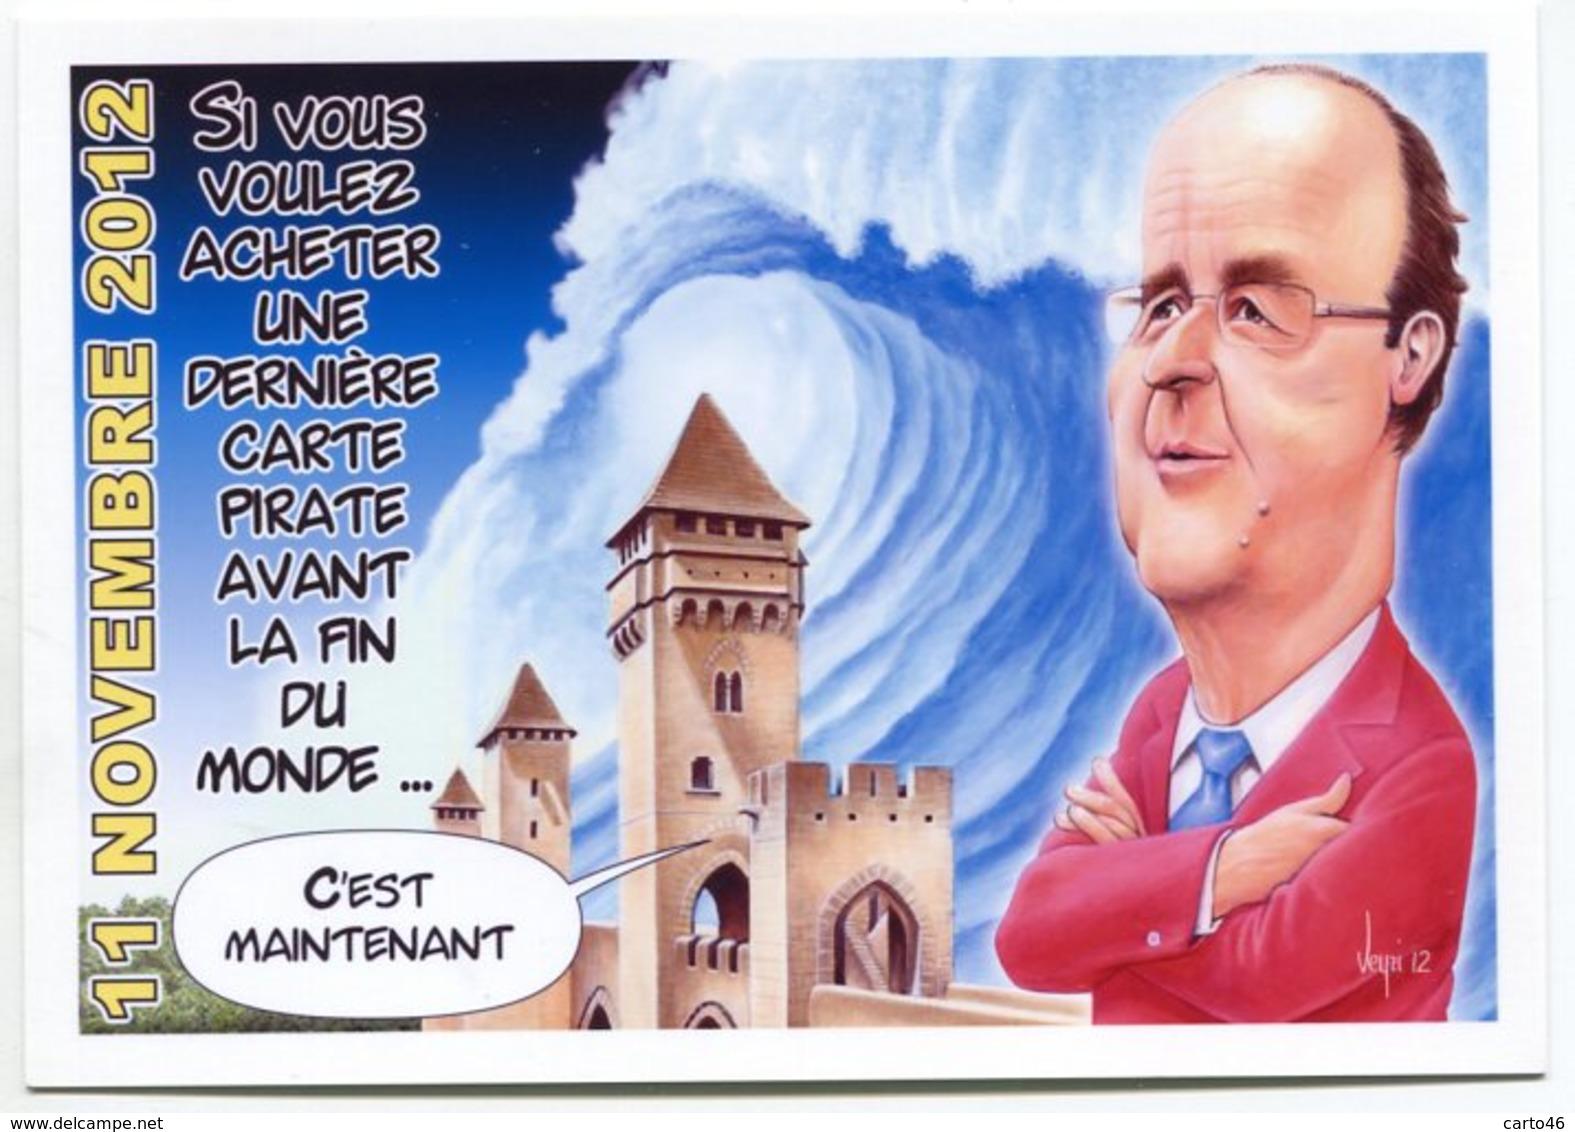 VEYRI - CAHORS Carte Pirate - 2012 - François HOLLANDE - Voir Scan - Veyri, Bernard